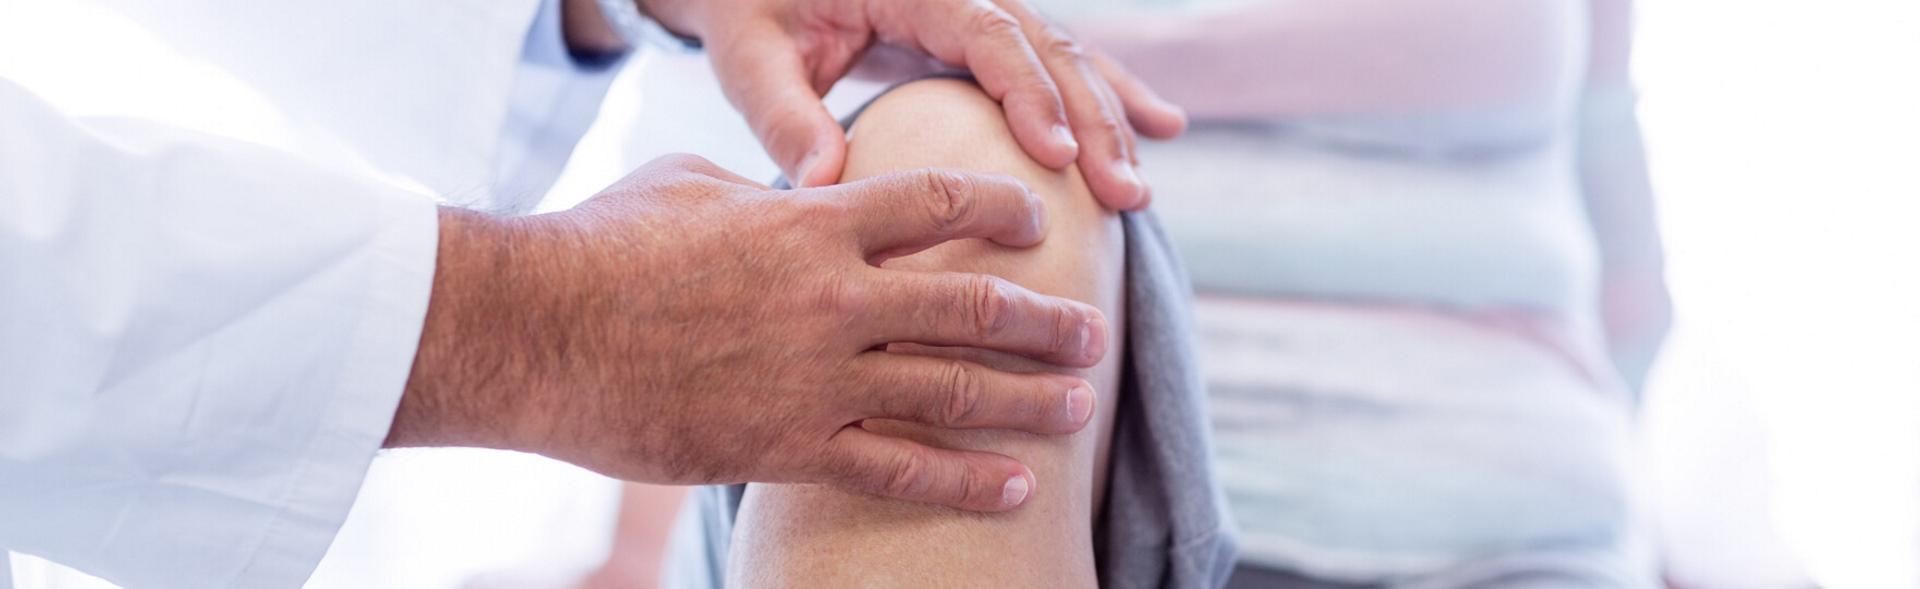 Artritis psoriatica (PsA) - Diagnose